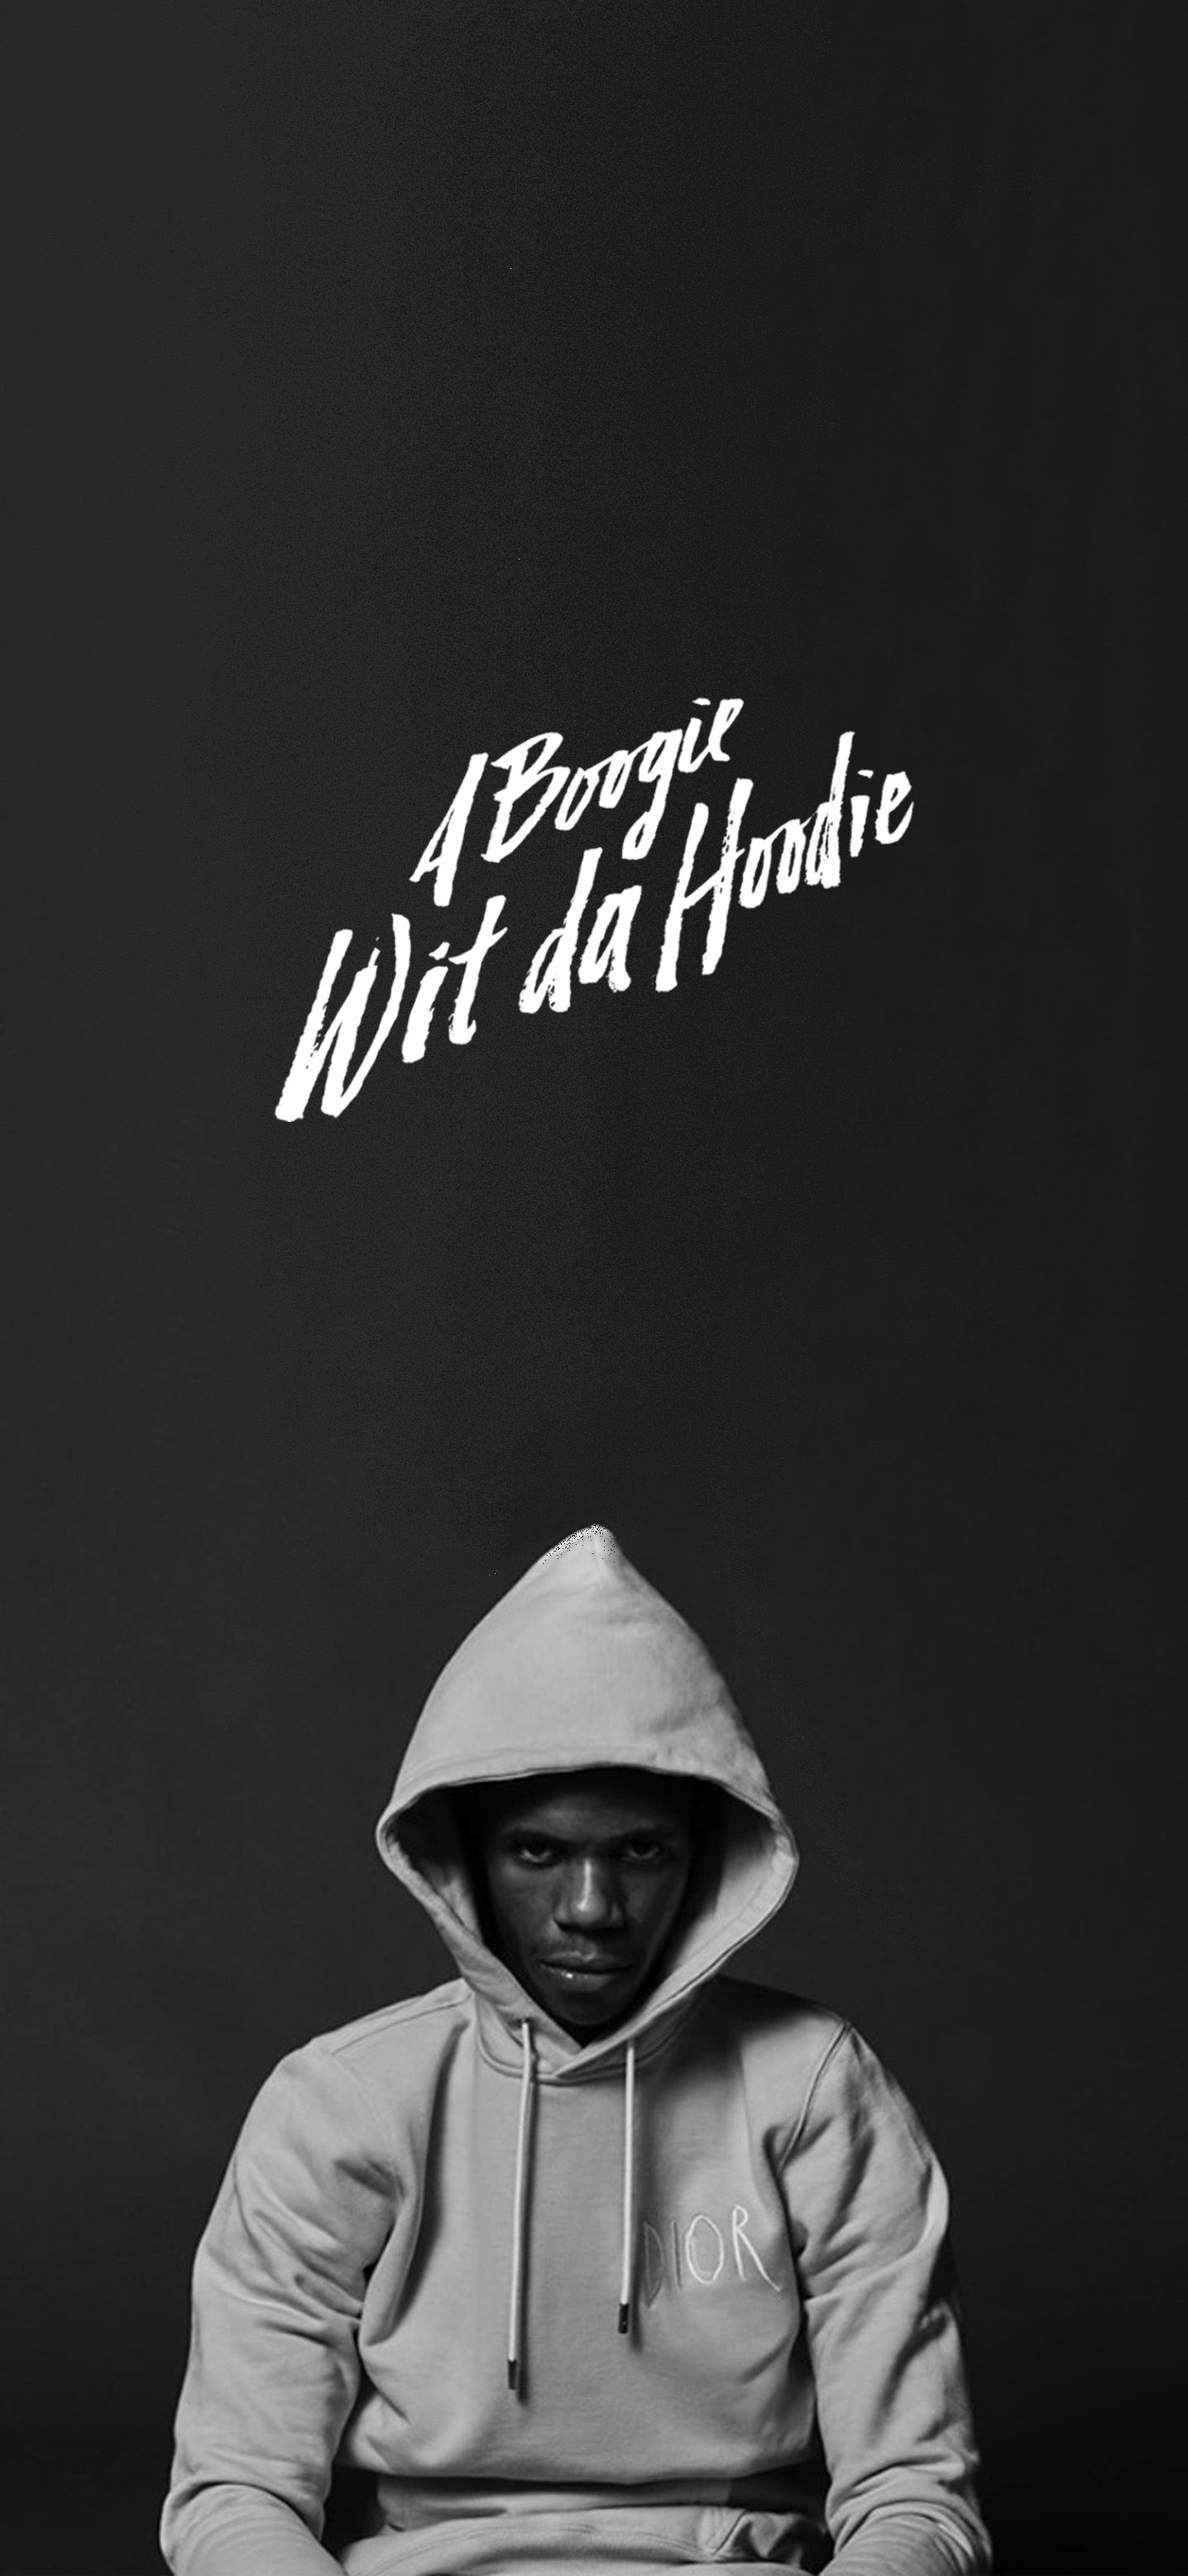 A Boogie Wit Da Hoodie Wallpaper Boogie Wit Da Hoodie Black And White Aesthetic Black And White Picture Wall